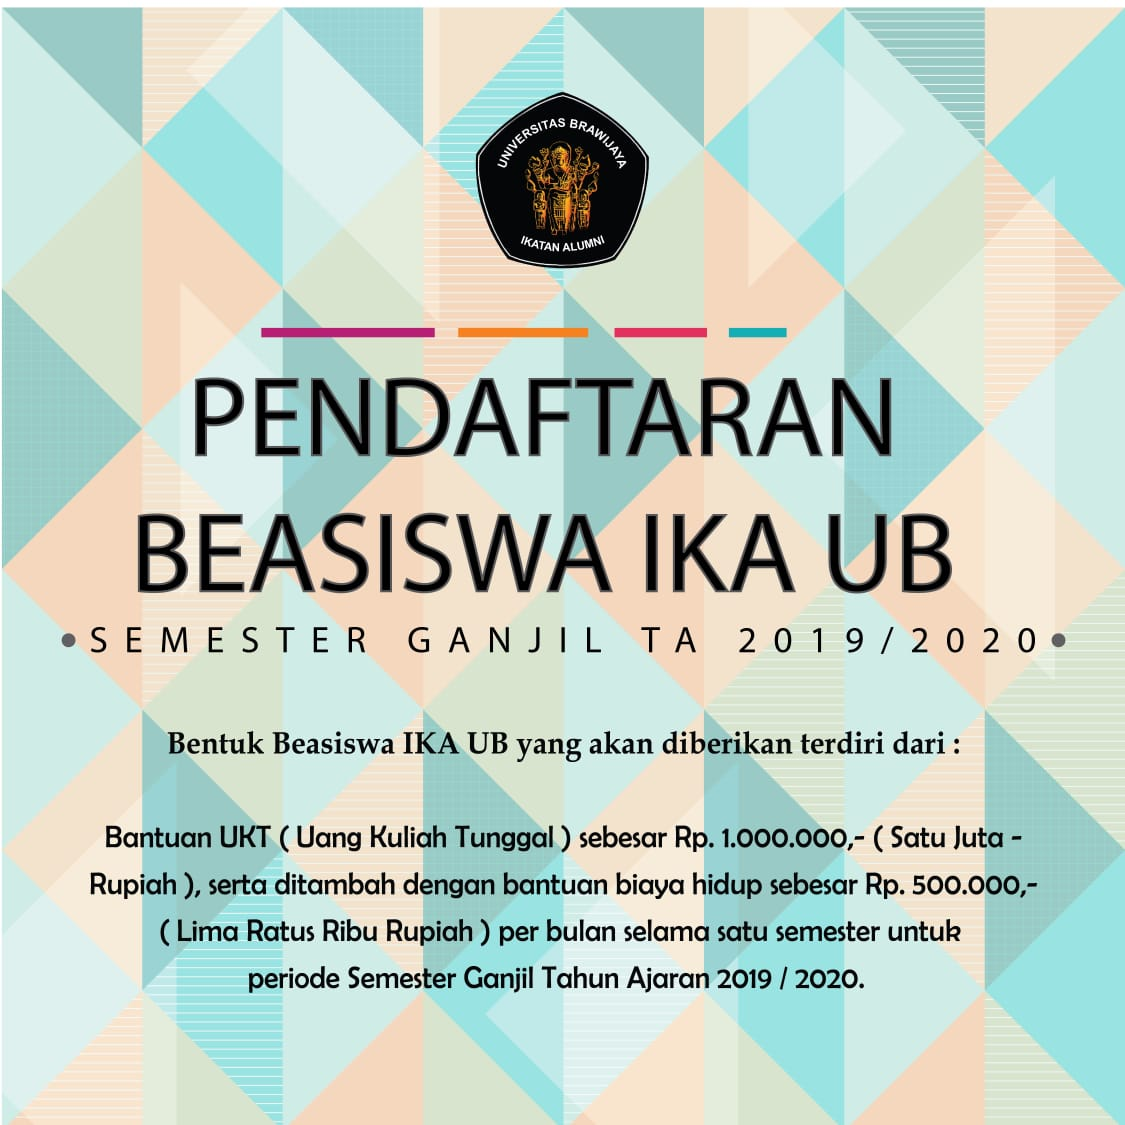 Informasi Pendaftaran Beasiswa IKA UB